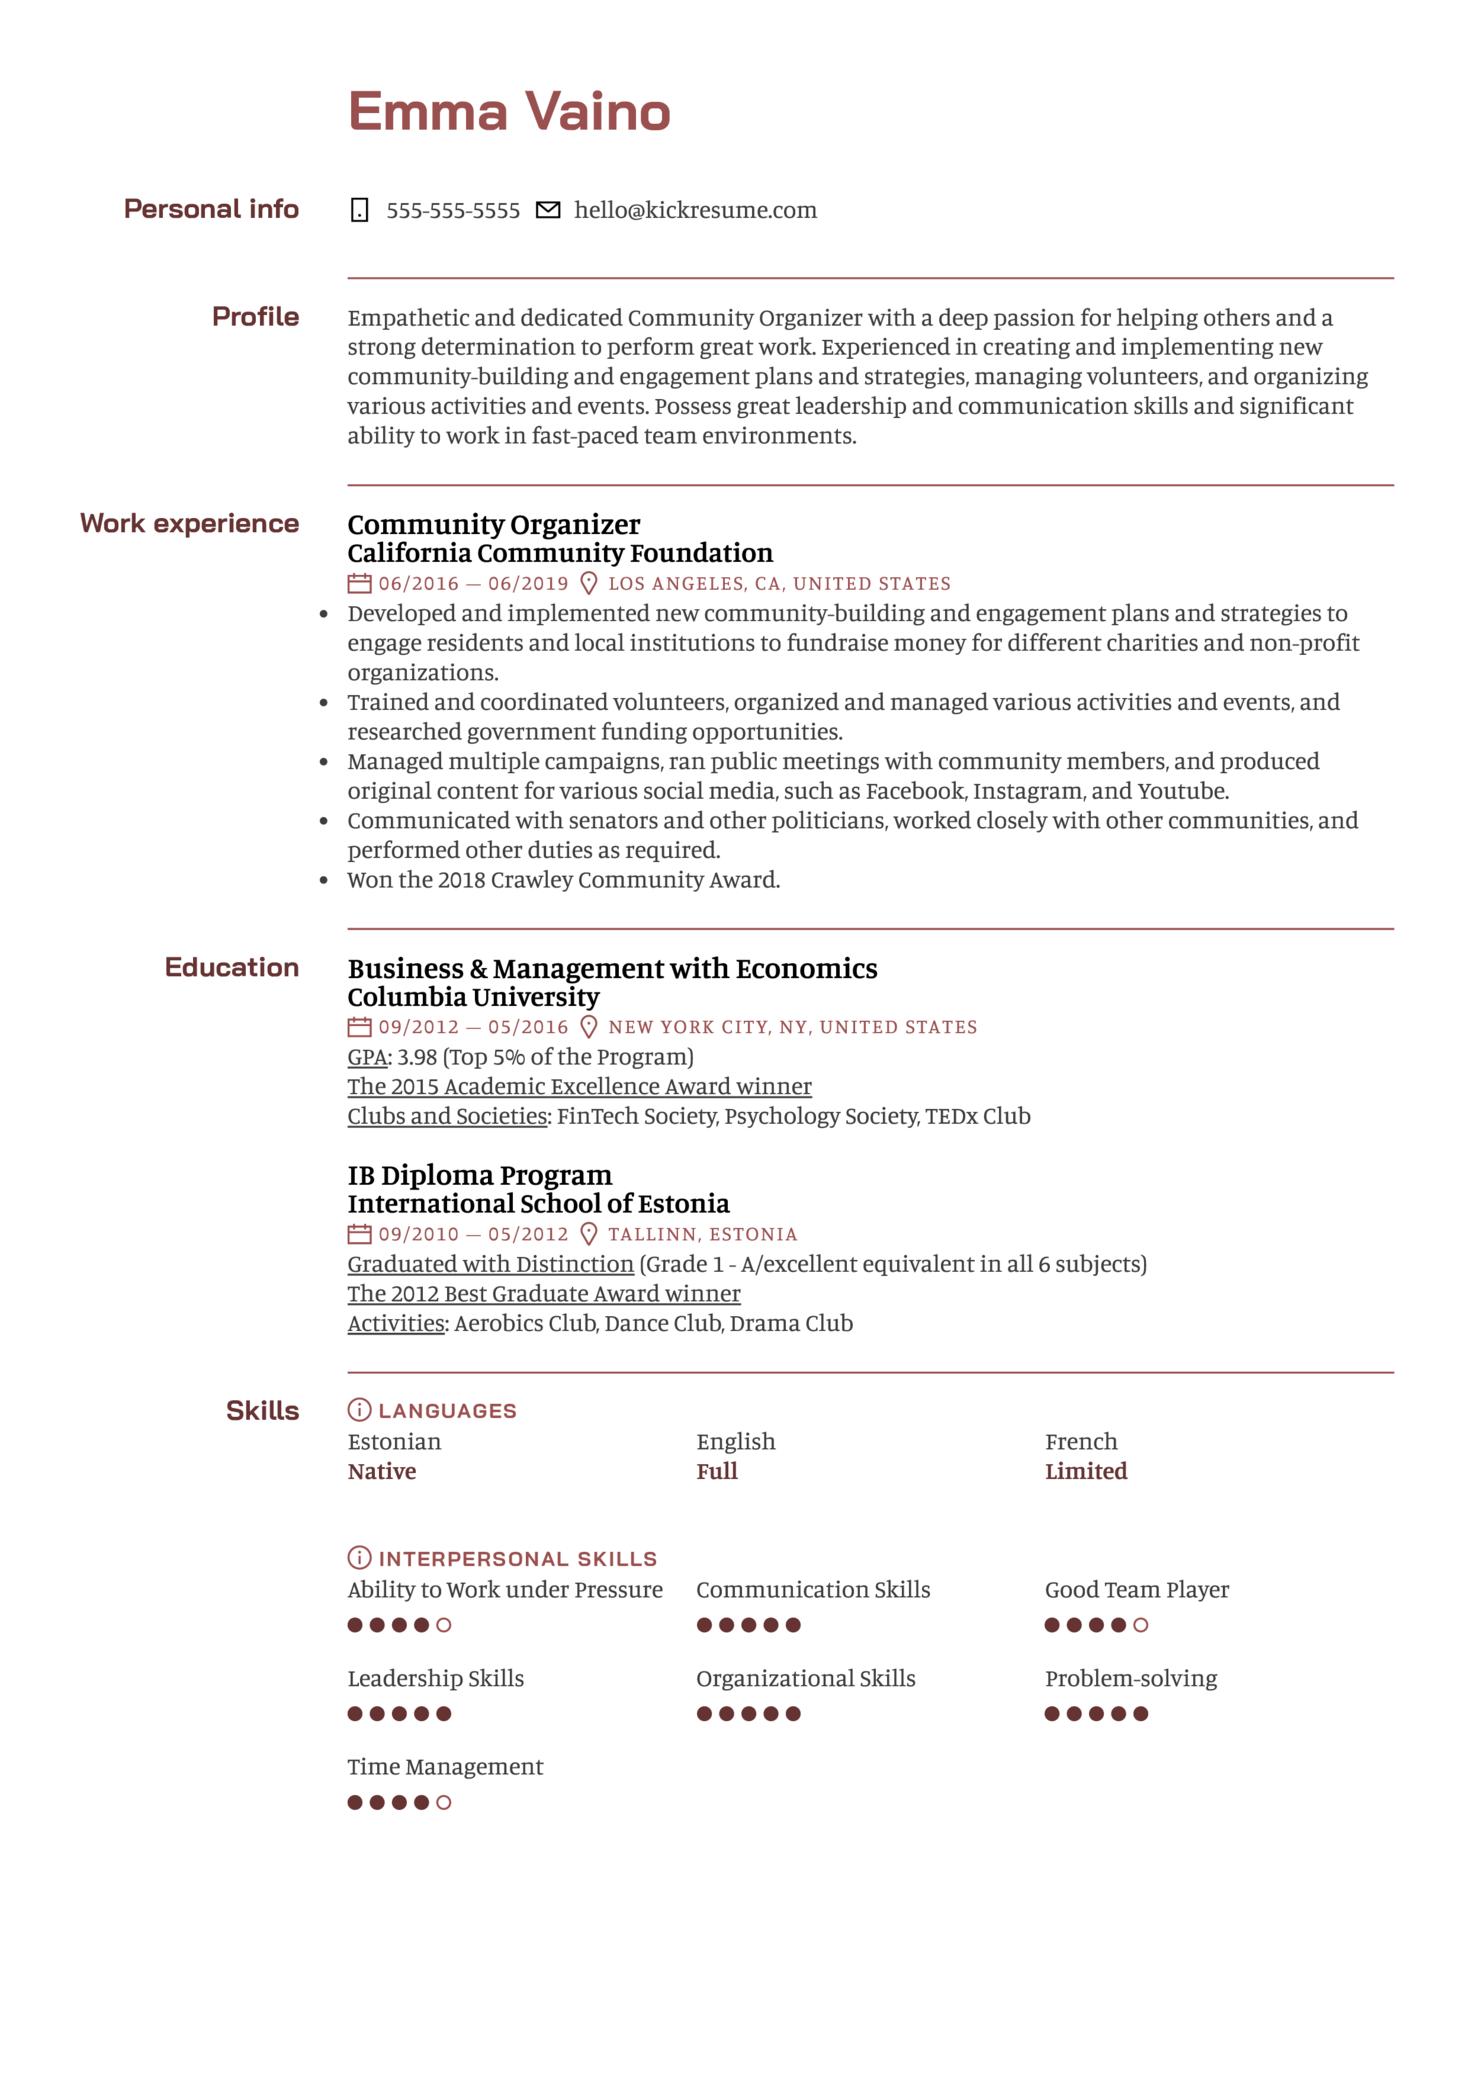 Community Organizer Resume Sample (Part 1)